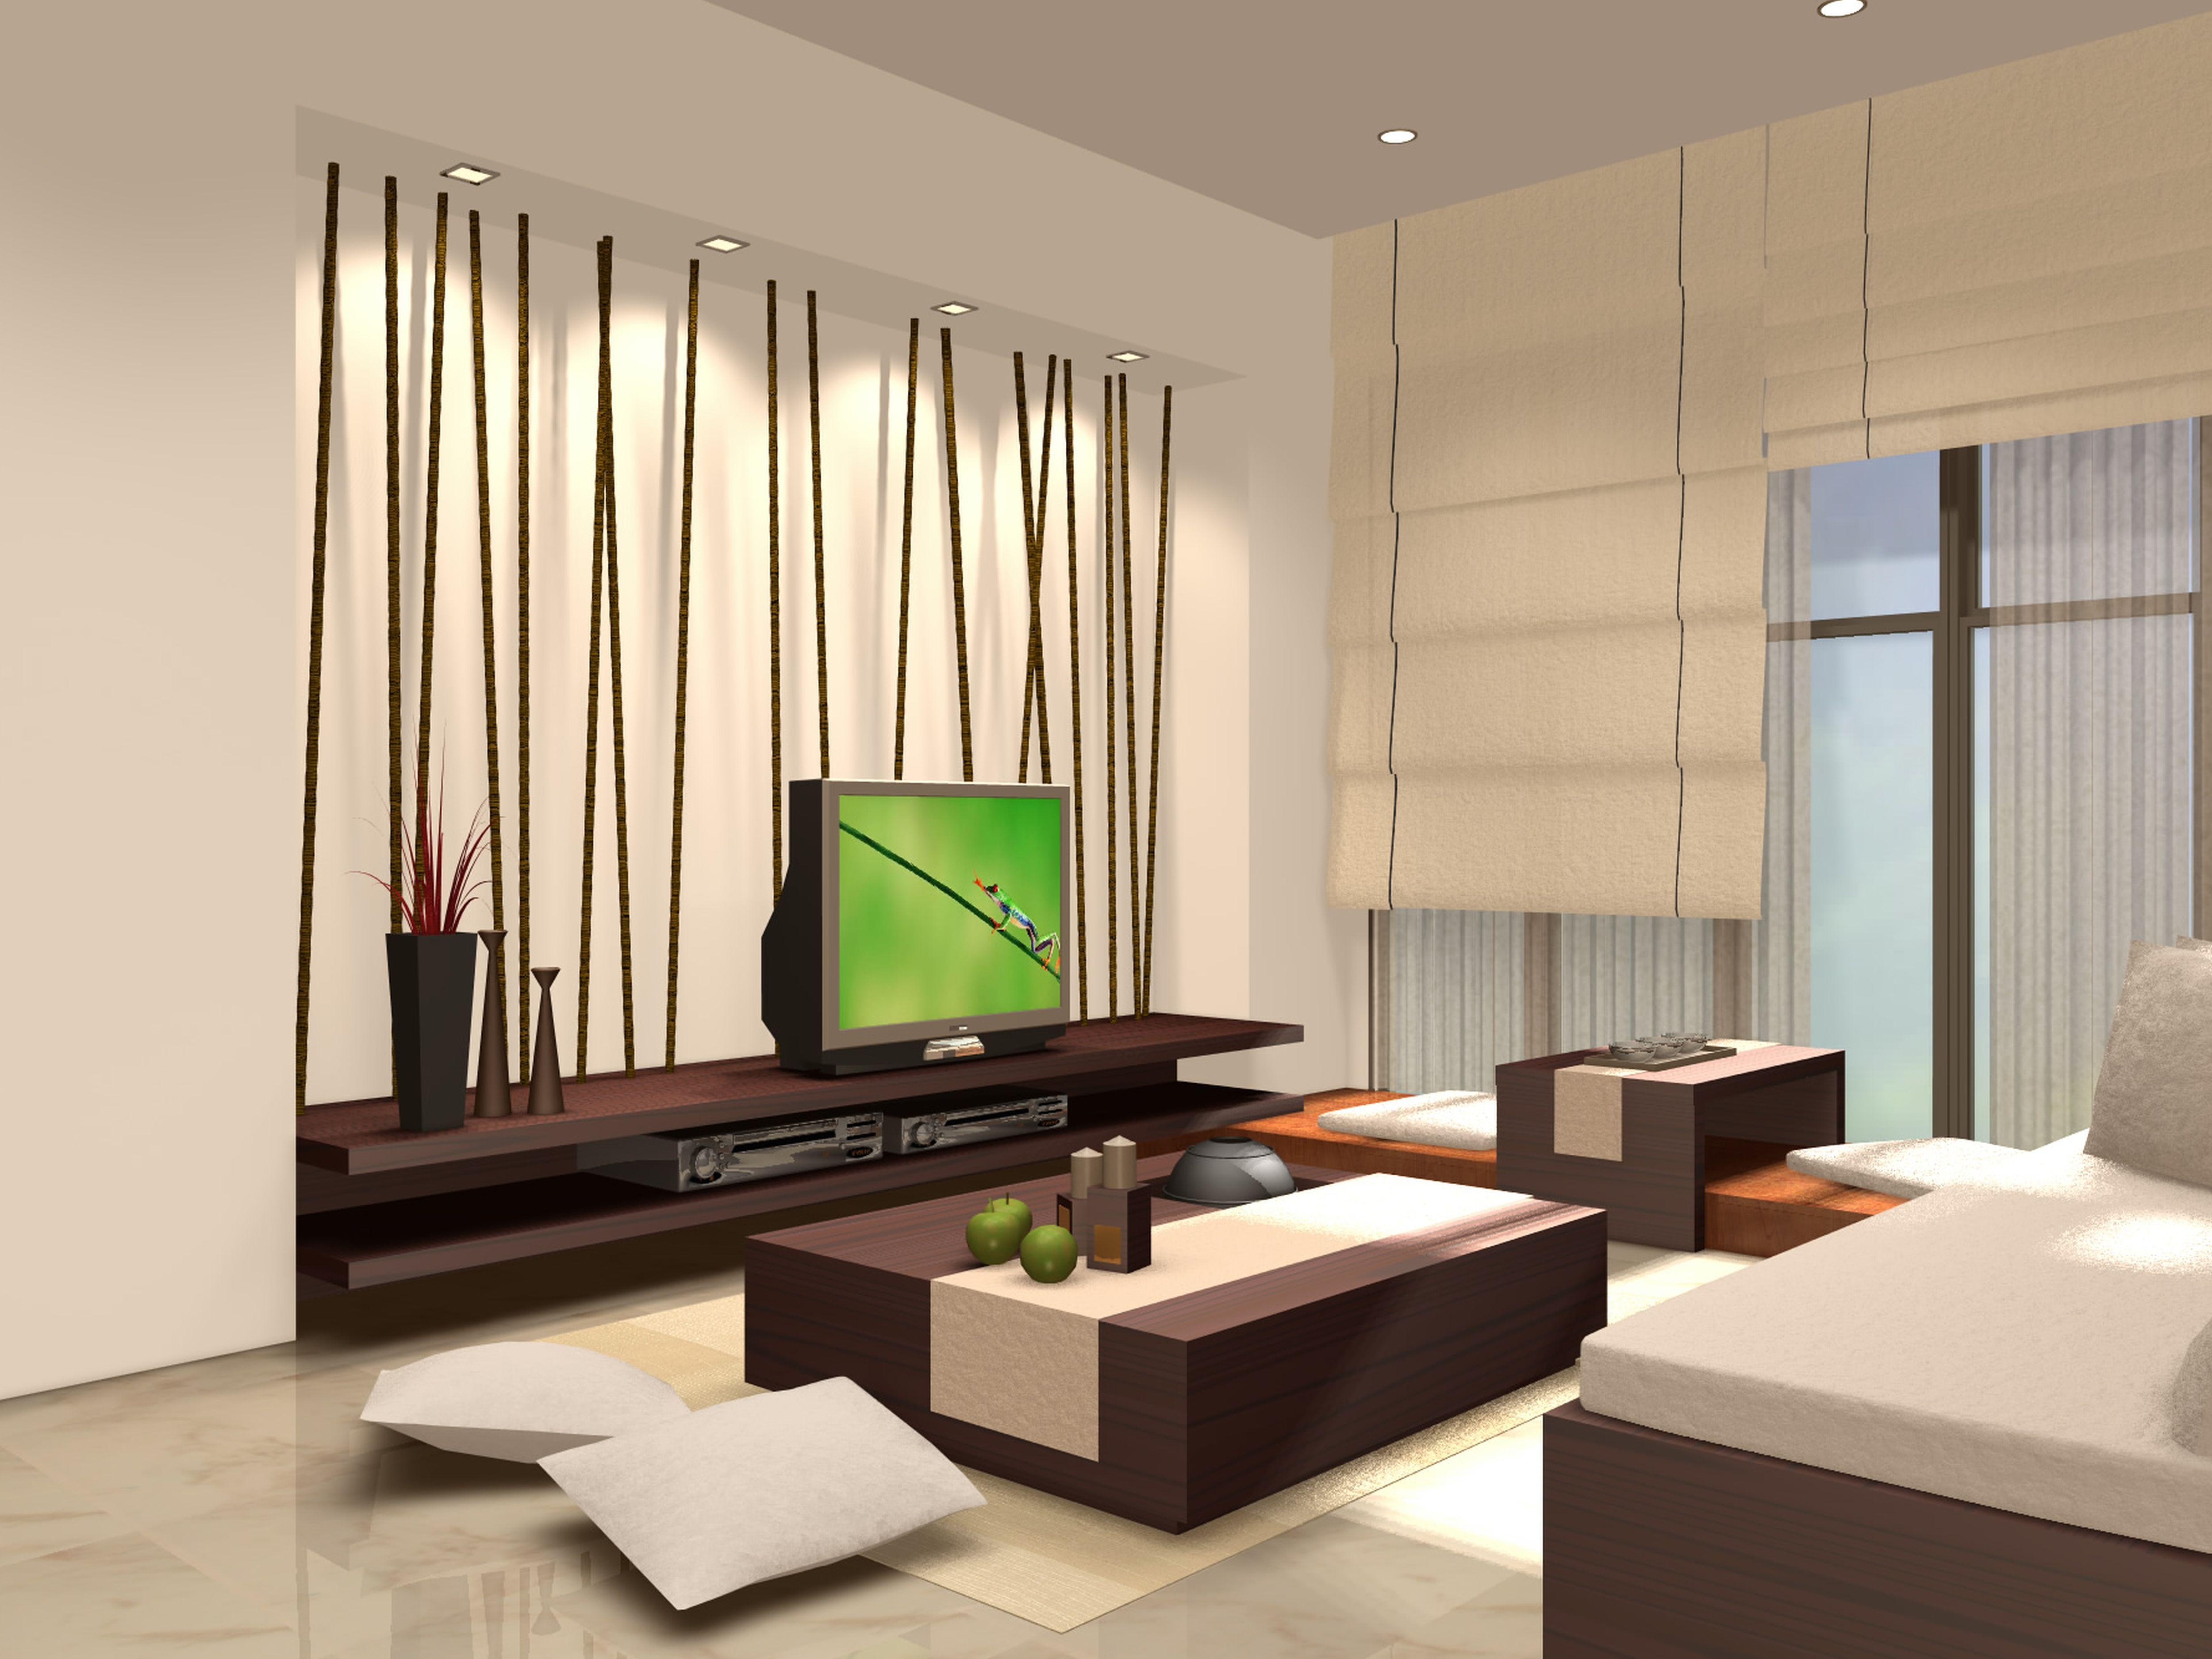 Design Your Own Living Room Furniture Modern Zen Interior Design Living Room  Hotel  Pinterest  Room